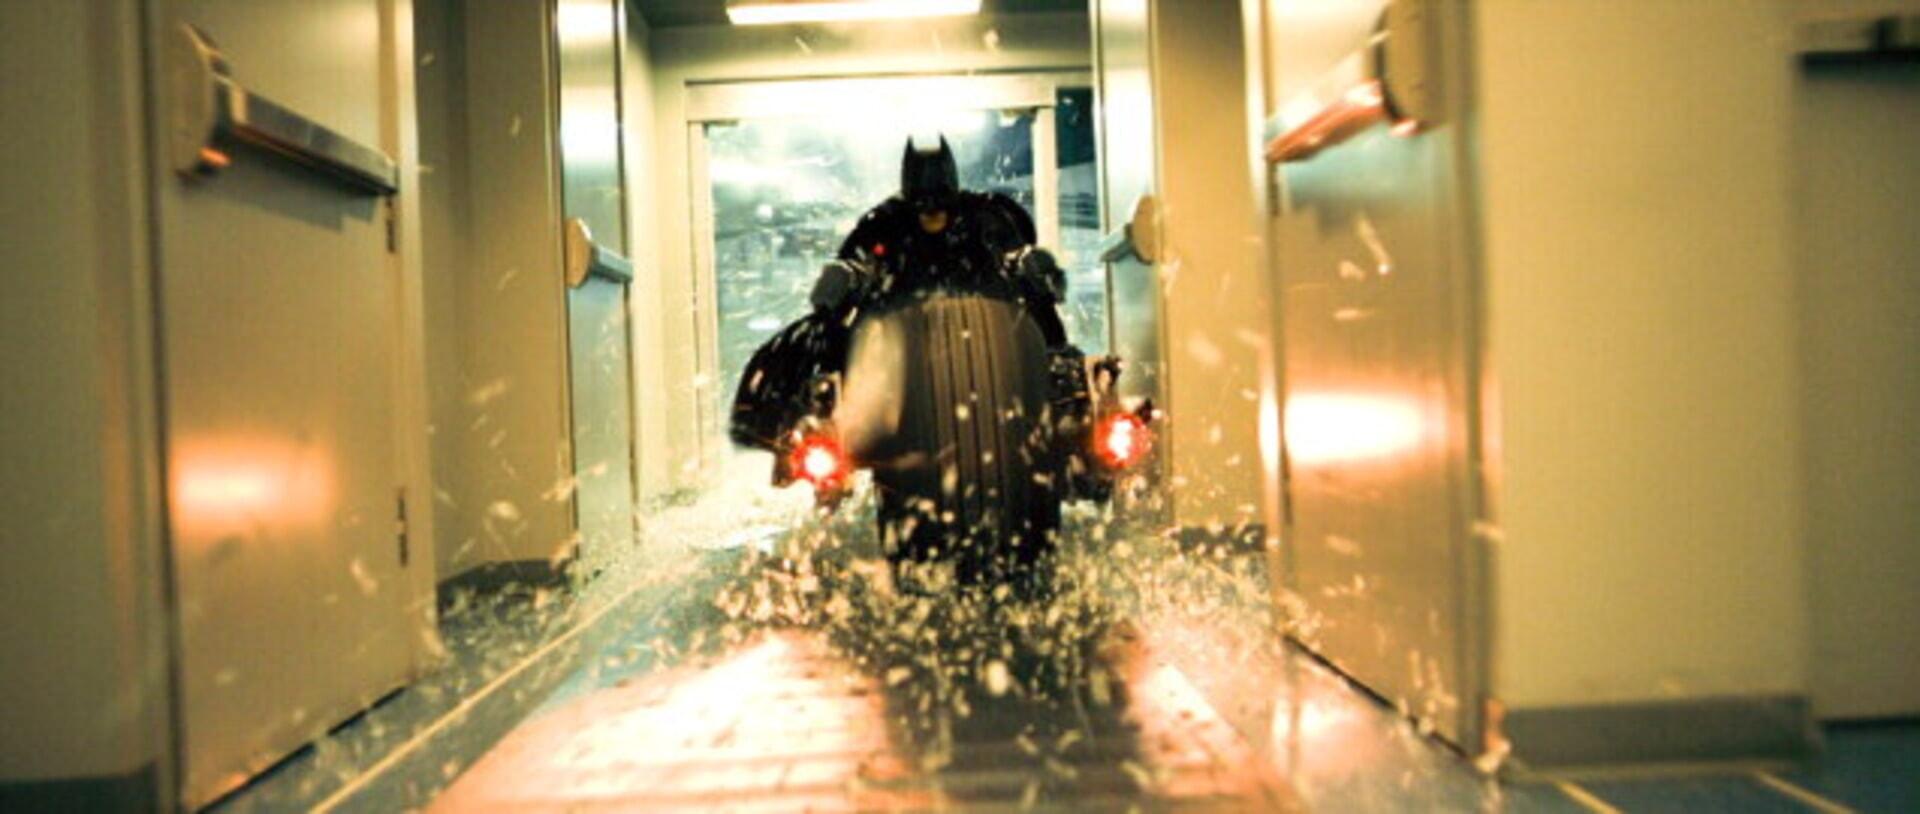 The Dark Knight - Image 41